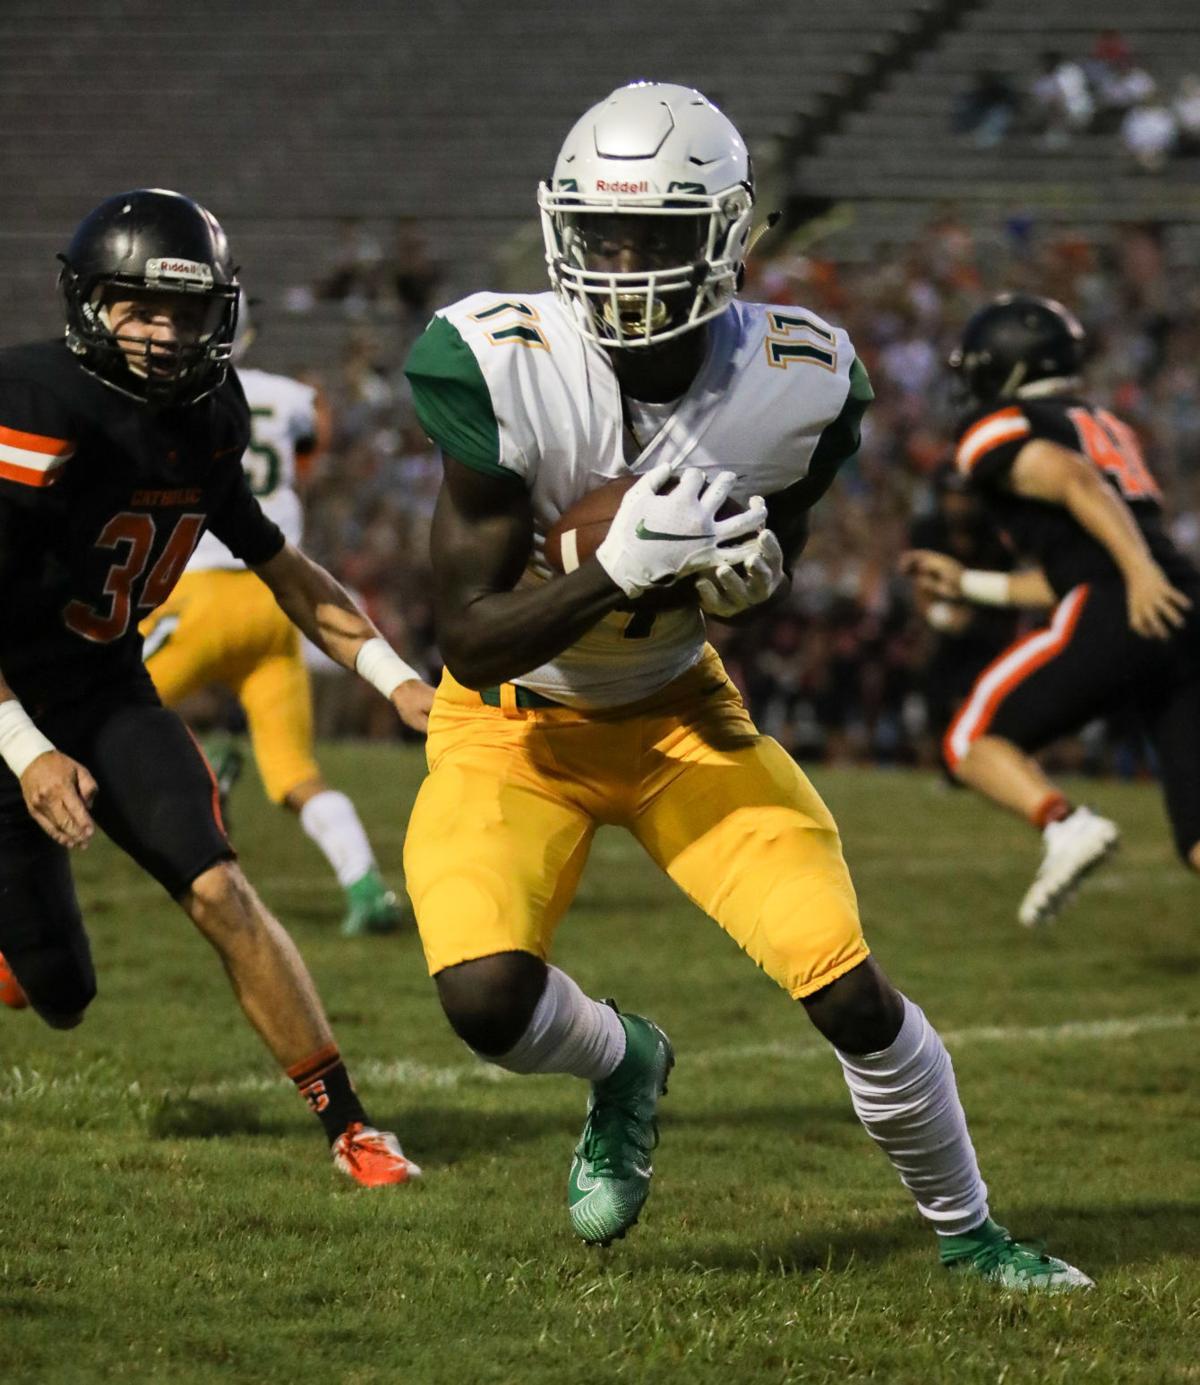 Walker vs. Catholic High football jamboree Brian Thomas